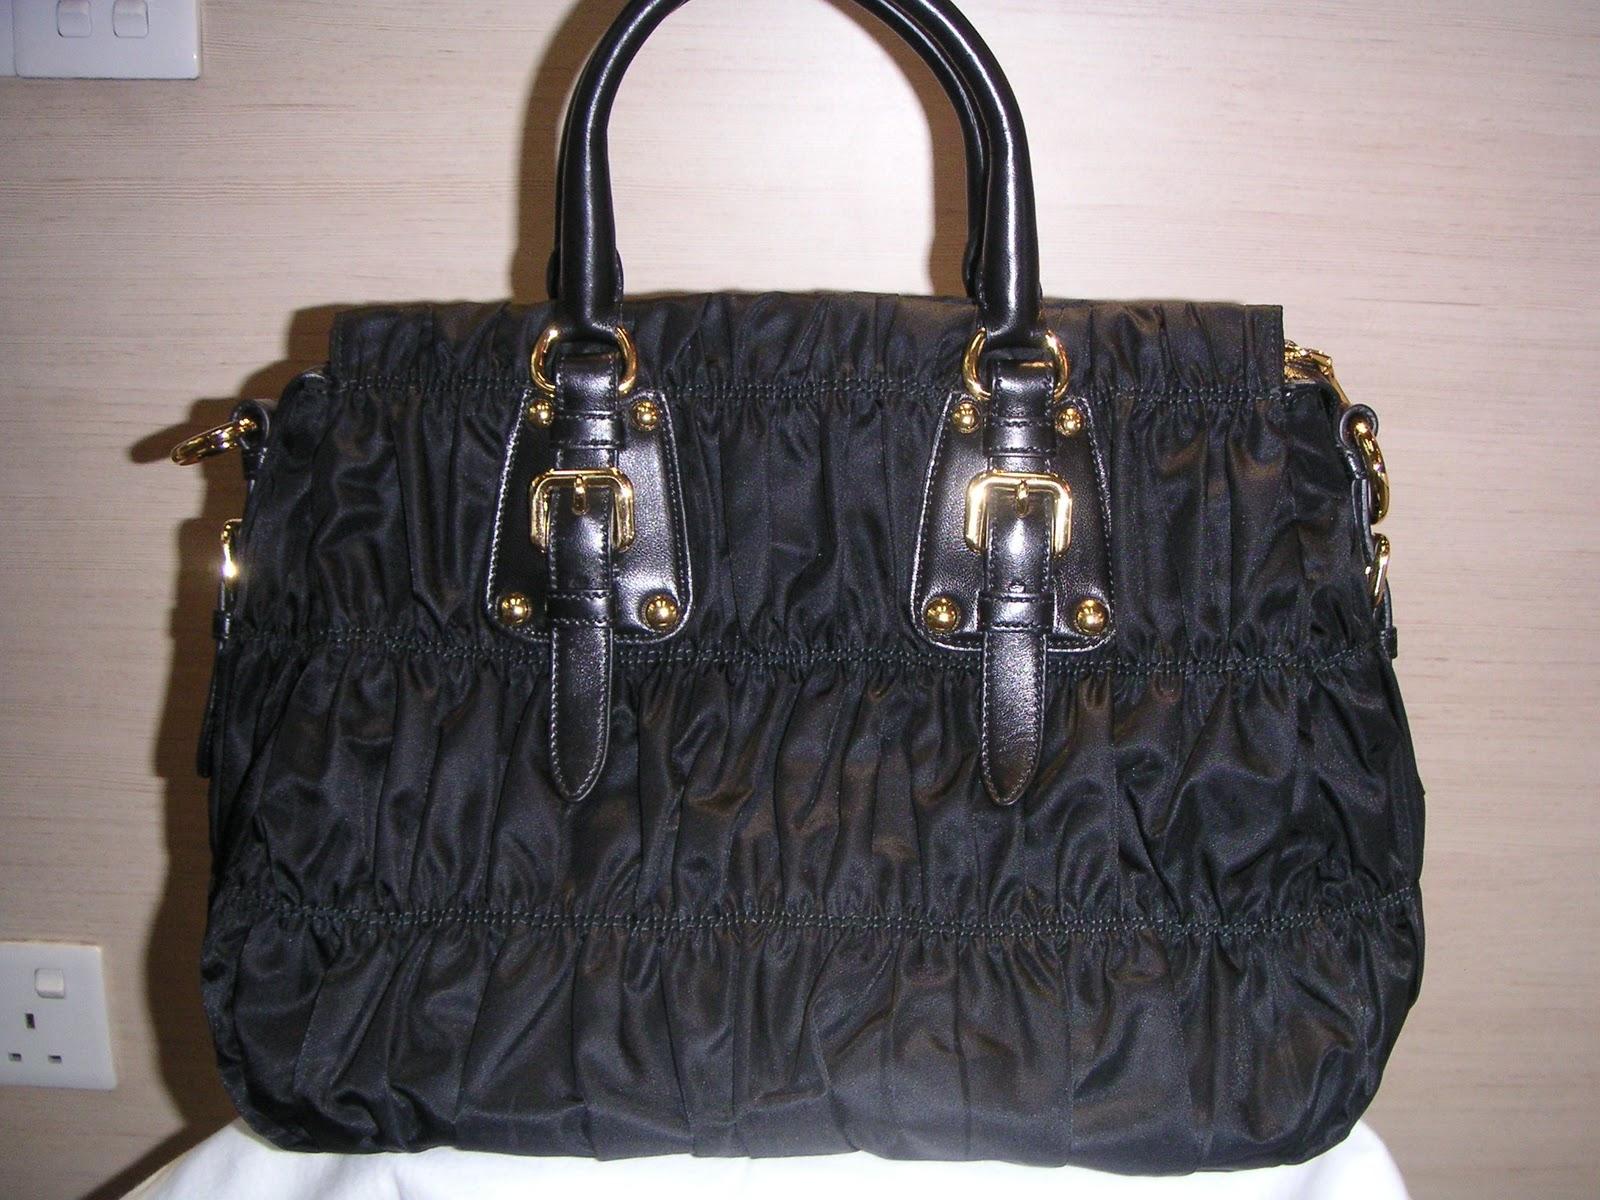 1534a104932d07 Branded Bags-Brand New & Preowned: Brand New Prada BN1336 Tessuto Gaufre